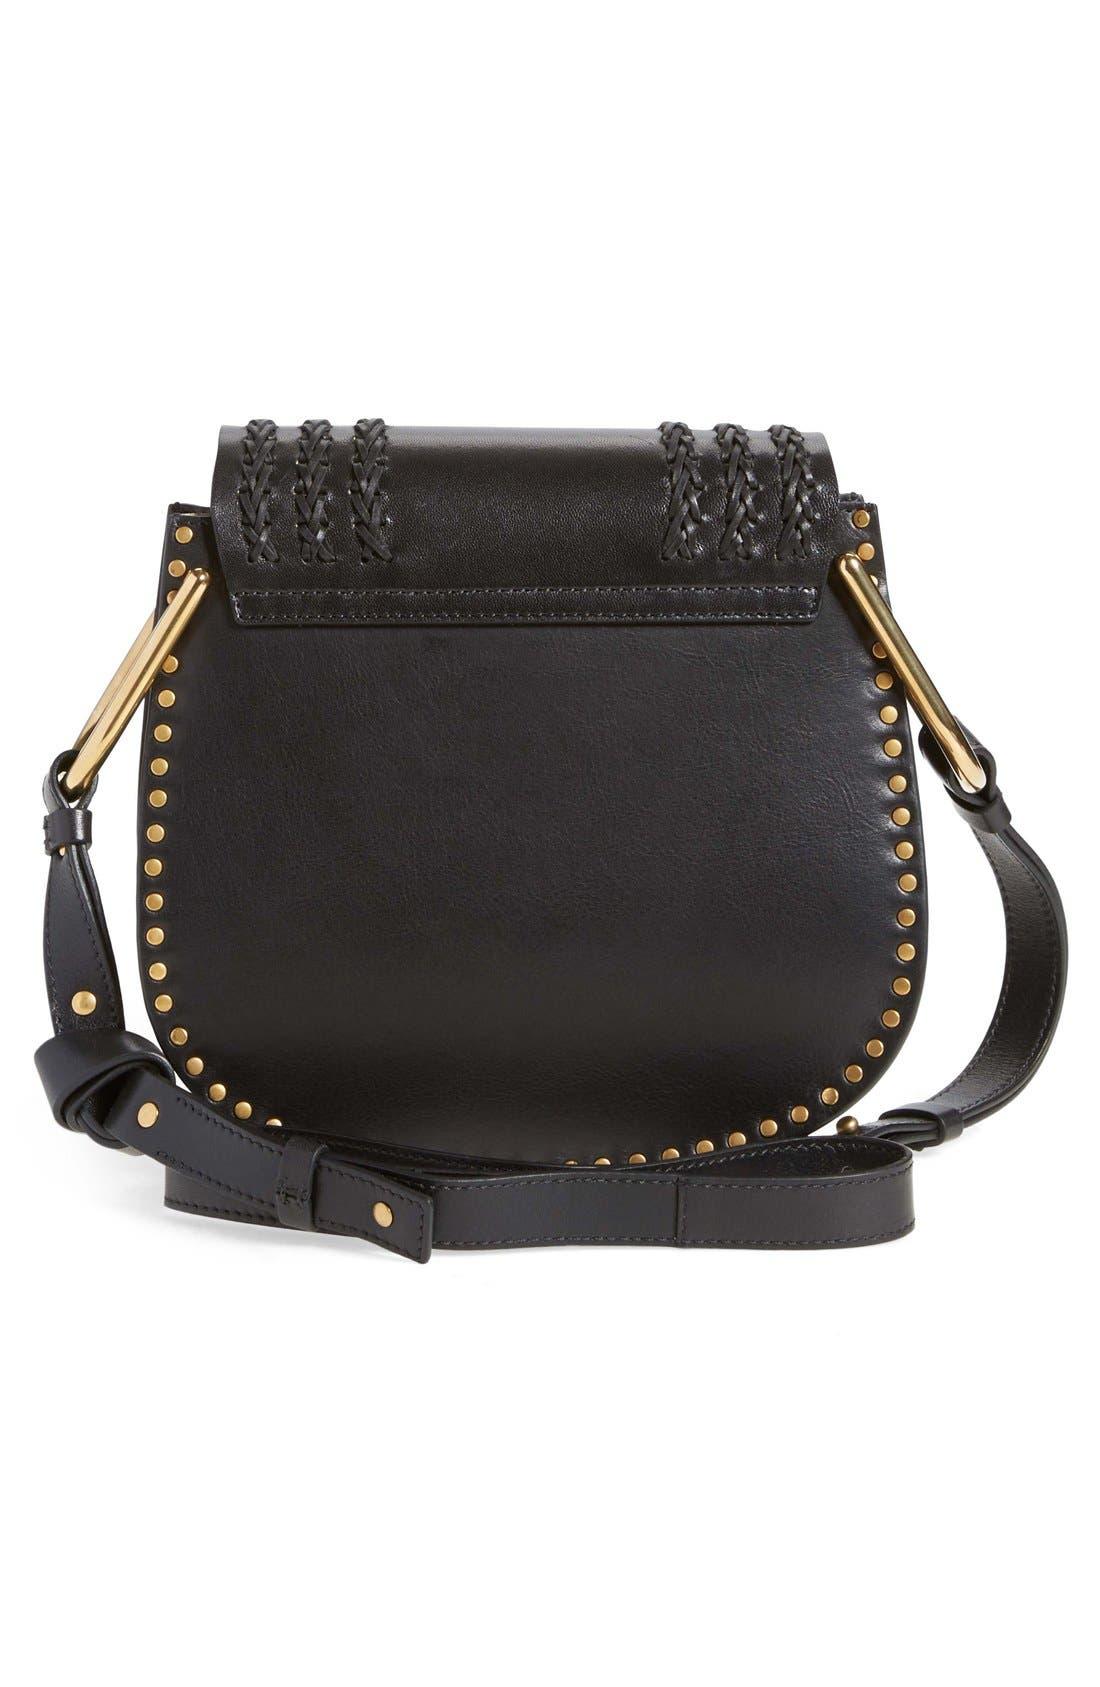 CHLOÉ,                             'Small Hudson' Studded Calfskin Leather Crossbody Bag,                             Alternate thumbnail 4, color,                             001